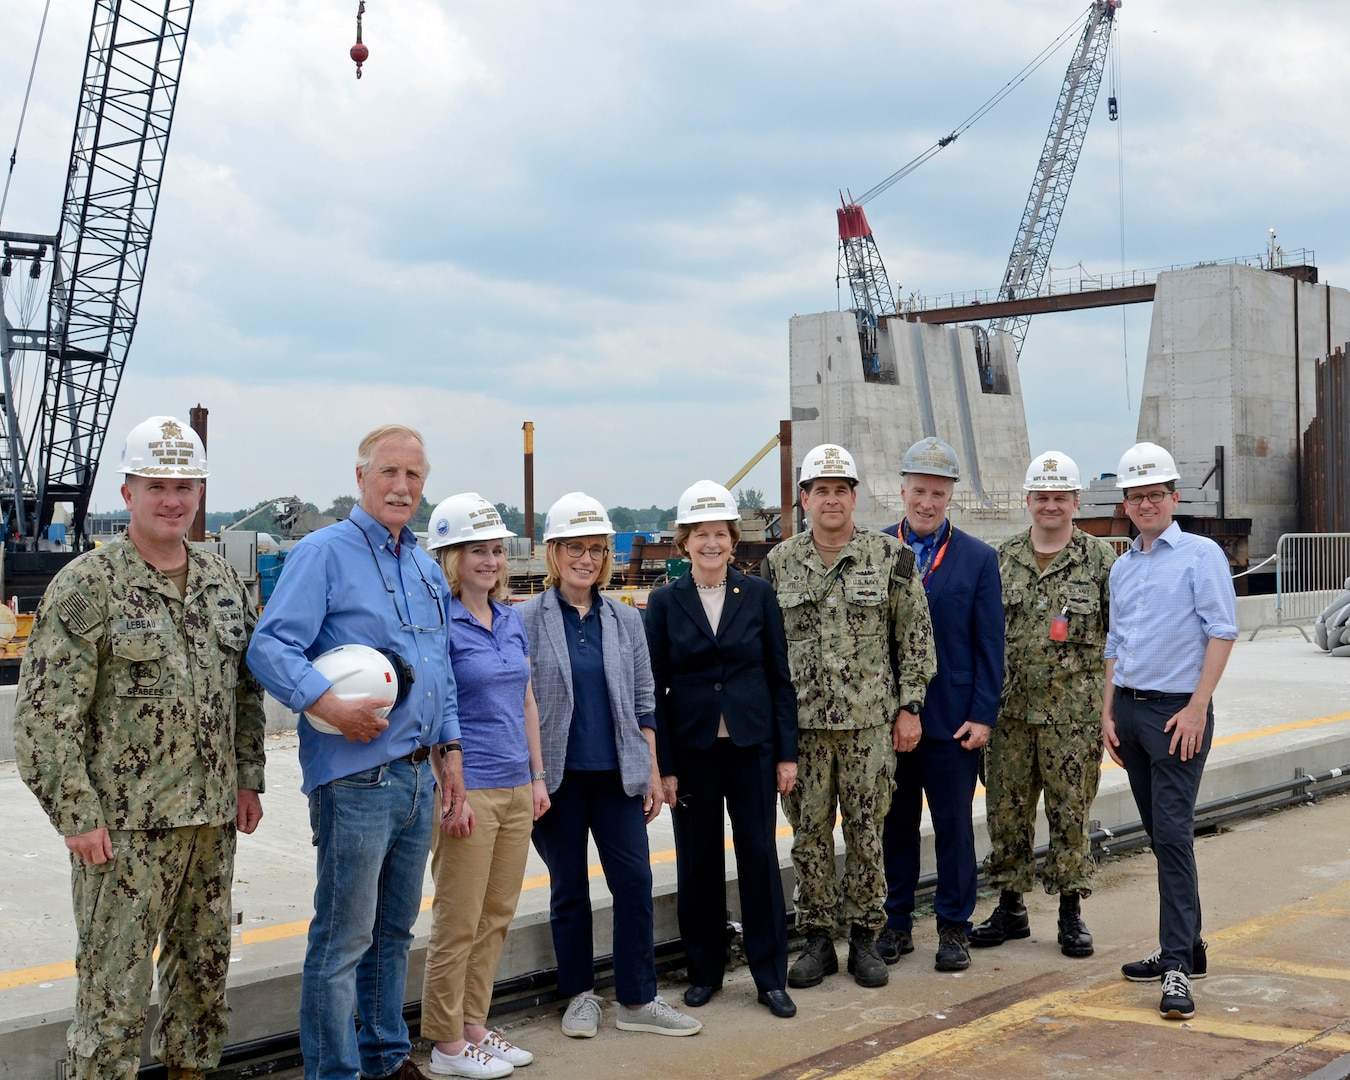 Portsmouth Naval Shipyard, Kittery, Maine,  July 7, 2021:  Deputy Secretary of Defense Dr. Kathleen Hicks visited the shipyard.